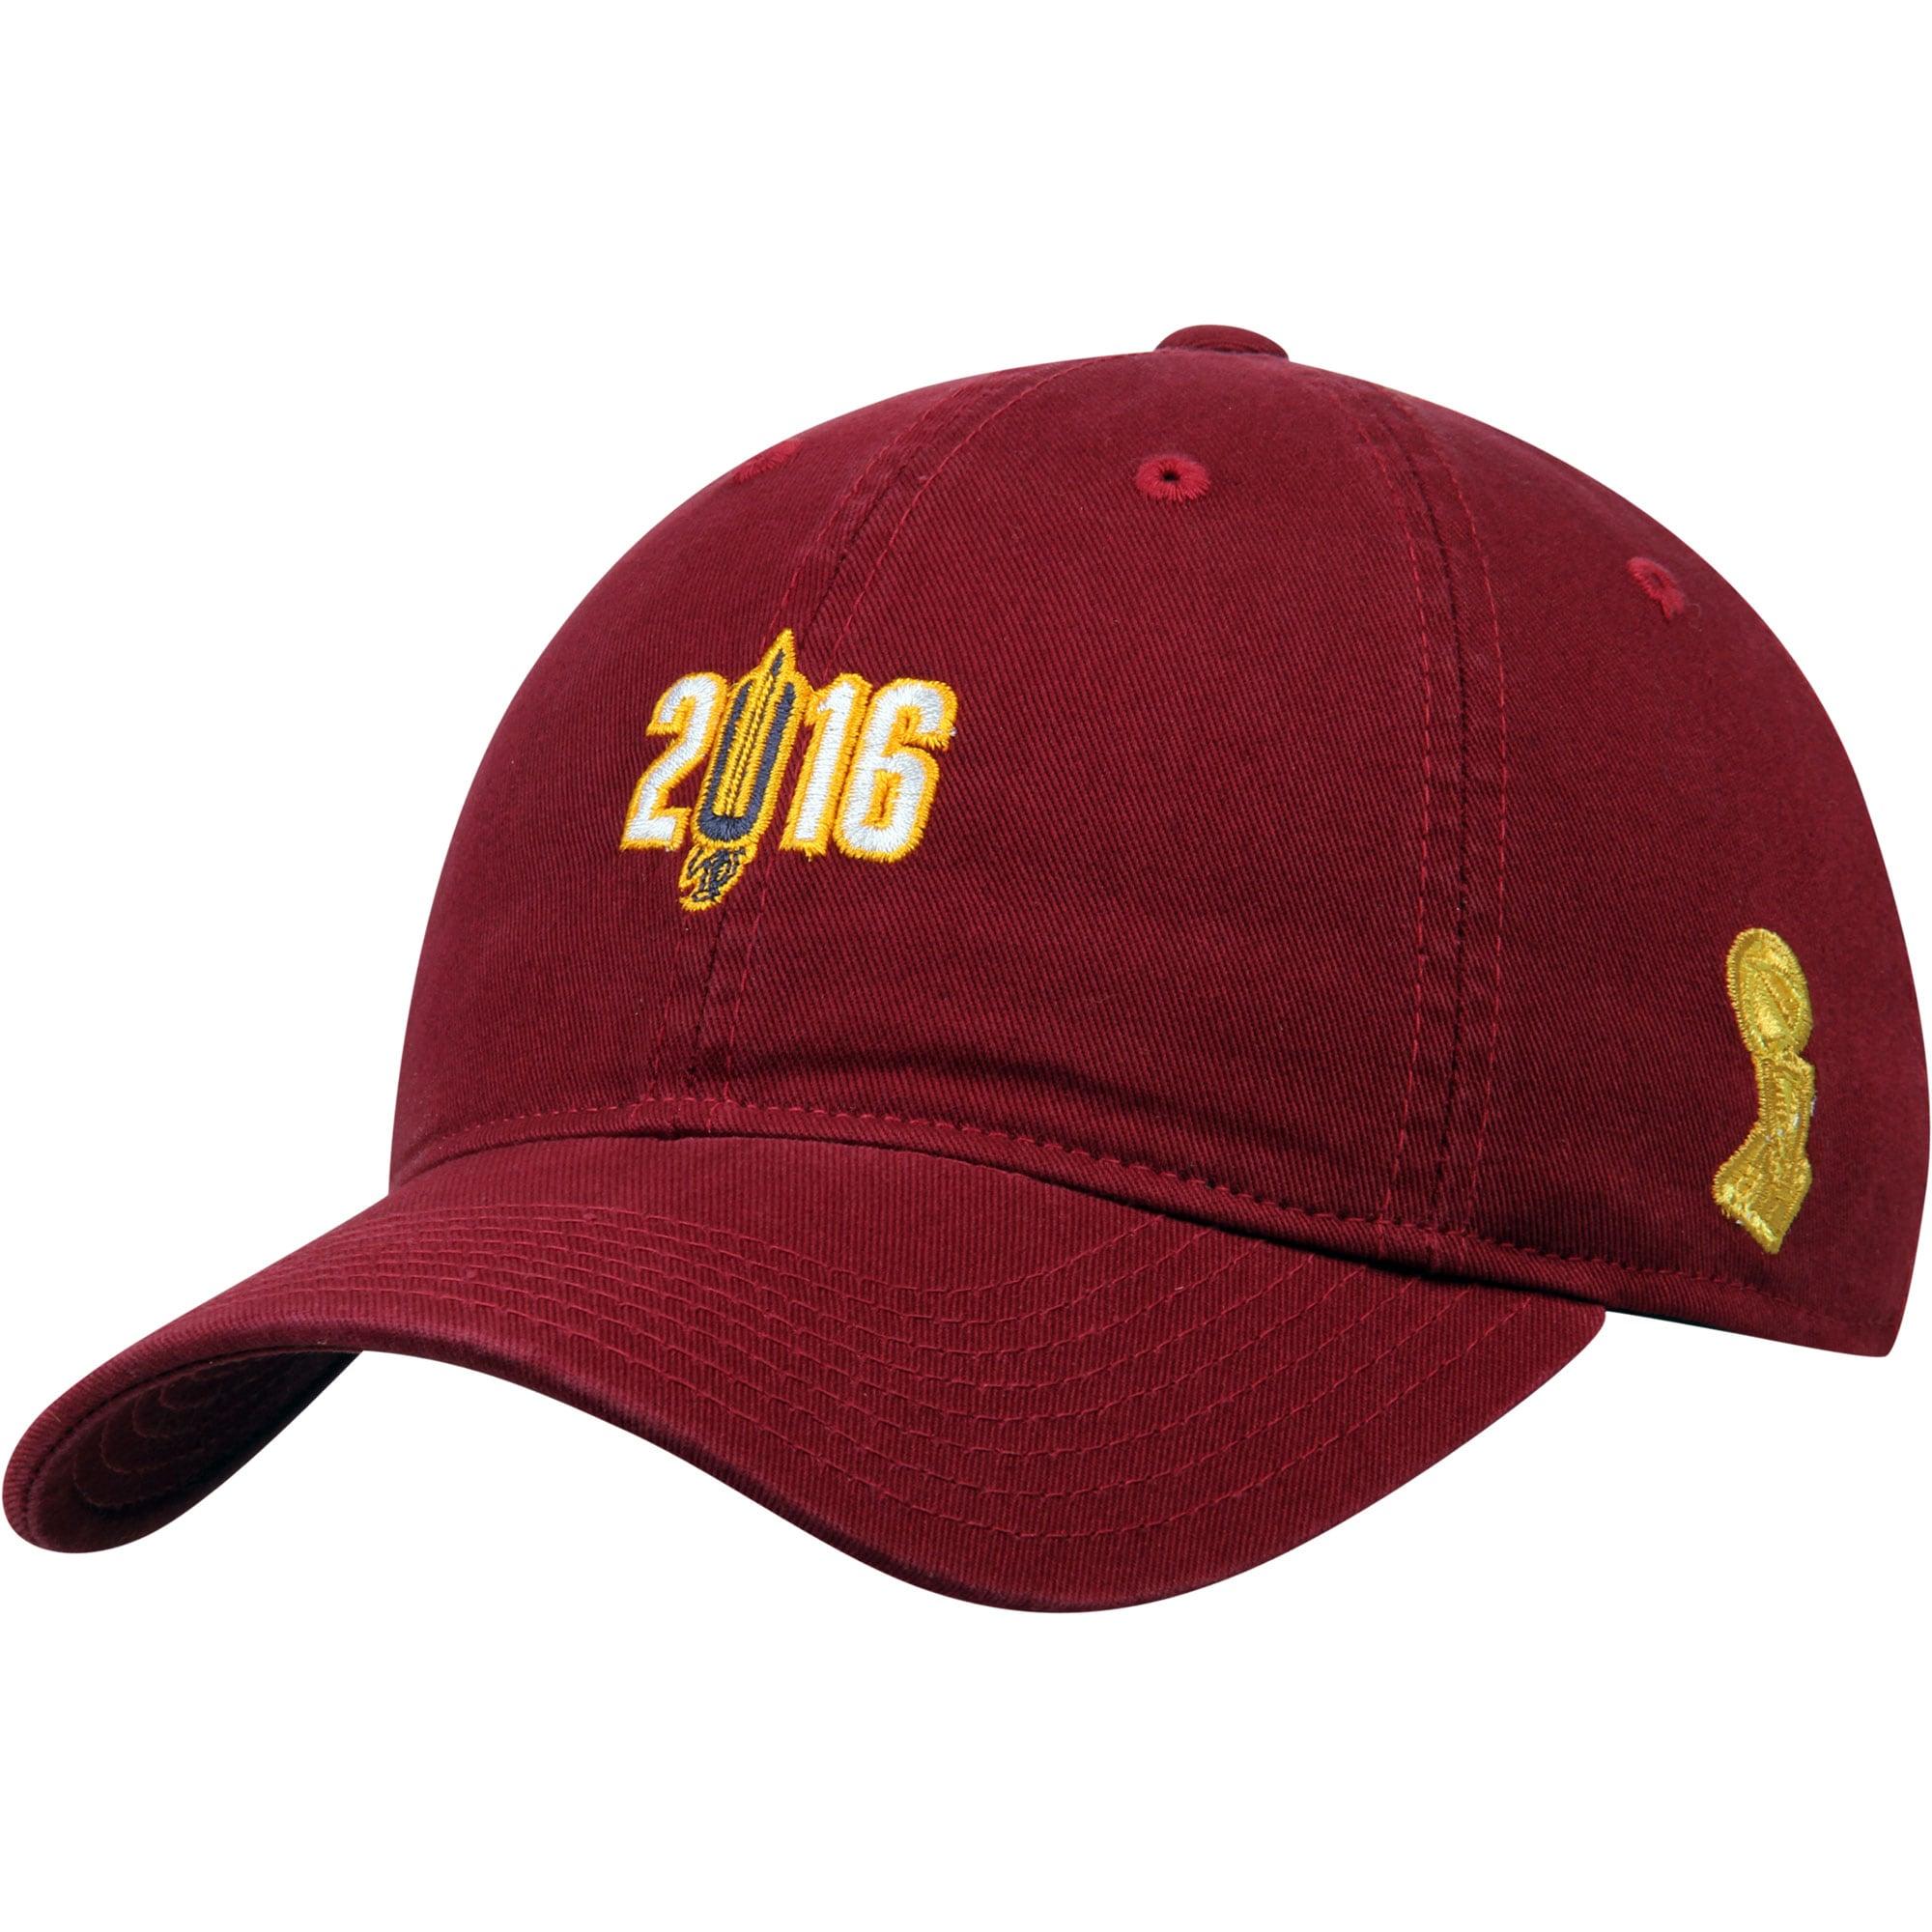 Cleveland Cavaliers Mitchell & Ness 2016 NBA Champions Dad Adjustable Hat - Wine